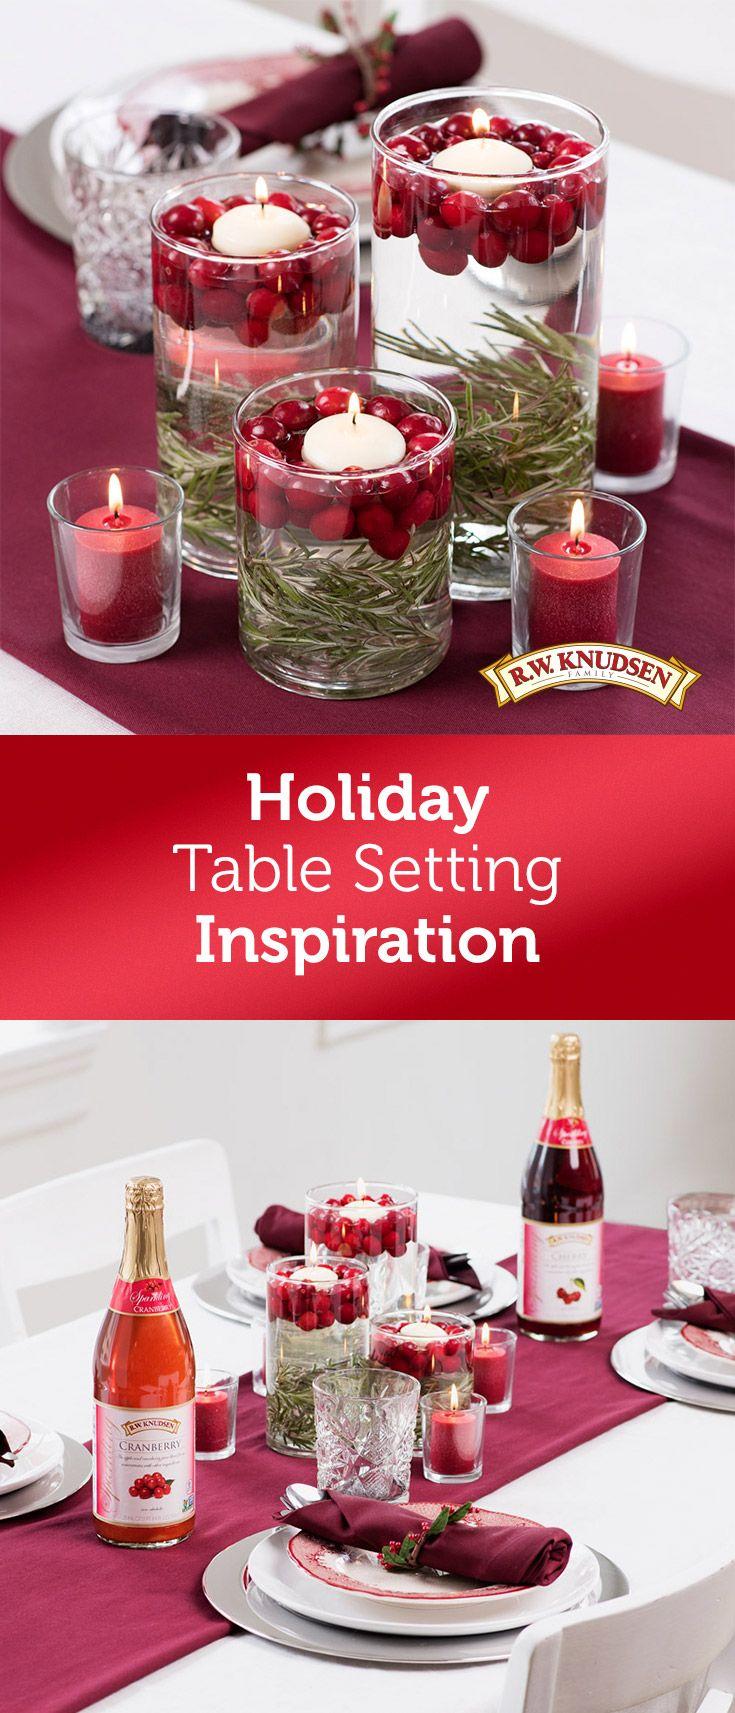 Celebrate around a festive centerpiece this holiday season